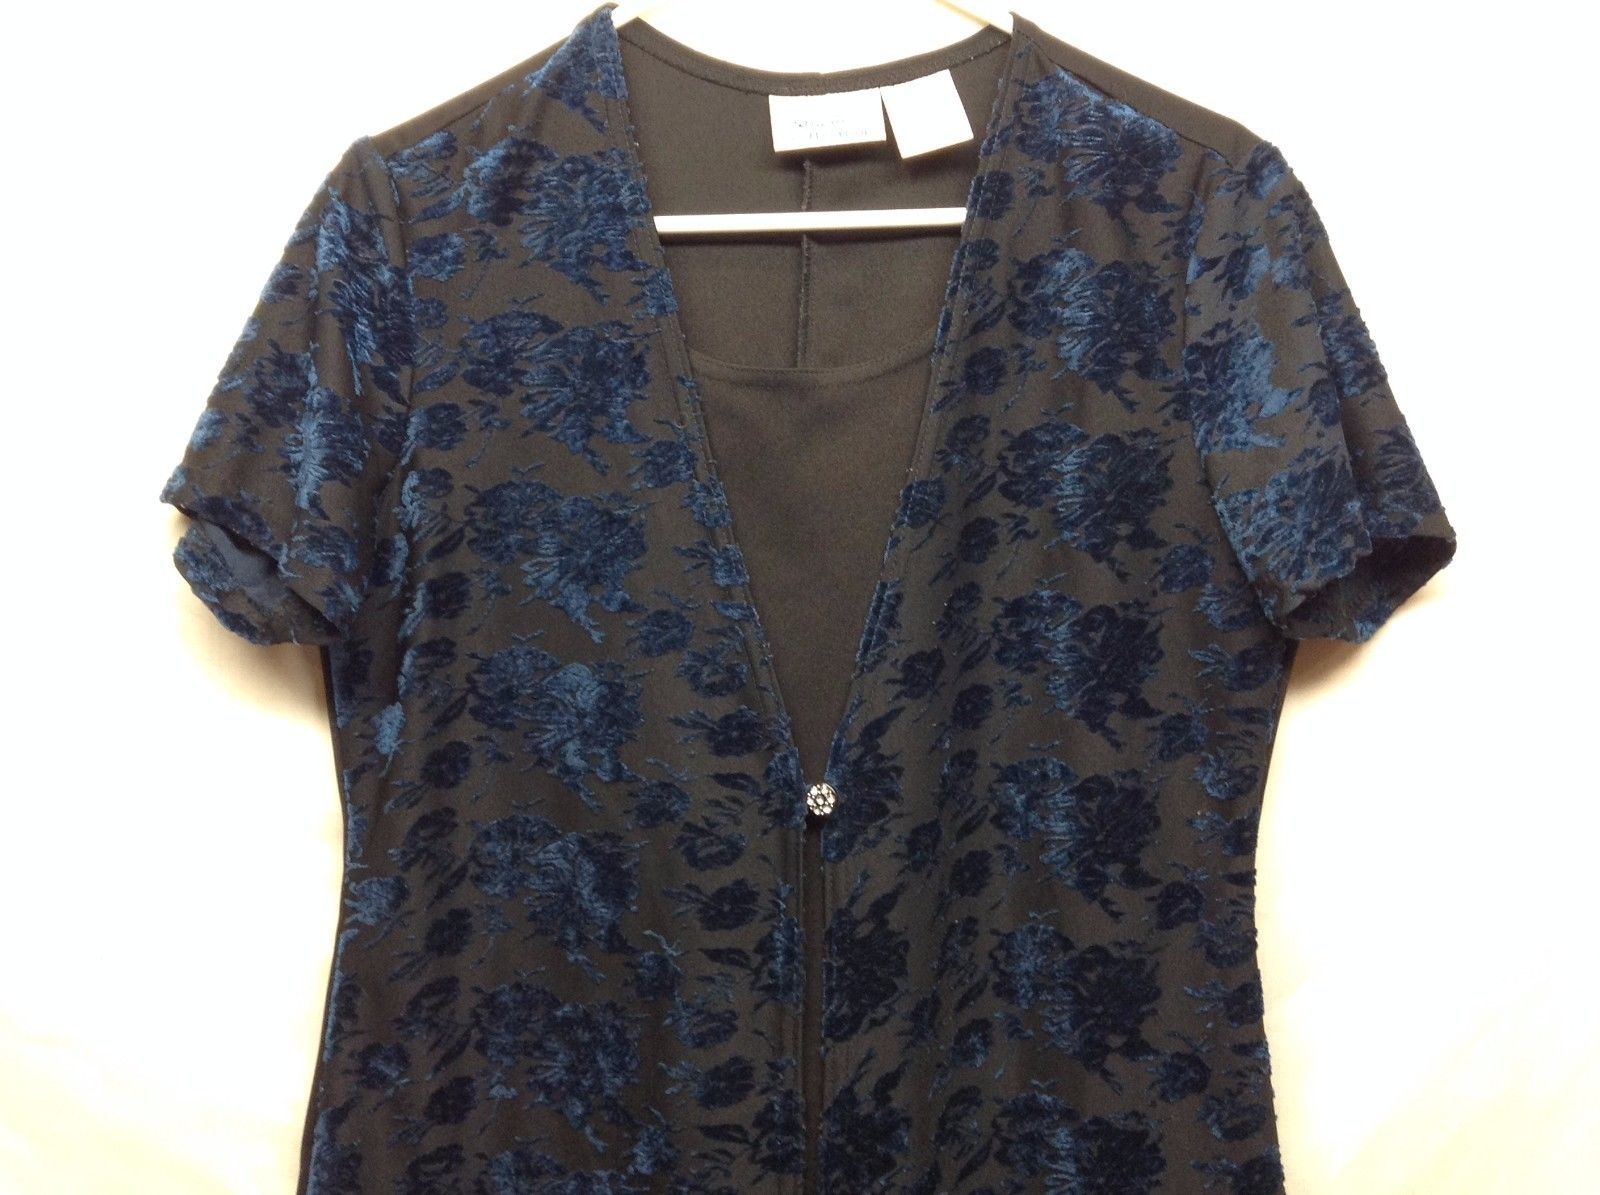 Kathie Lee Collection Black w Blue Floral Embroidery Dress w Jacket Sz M